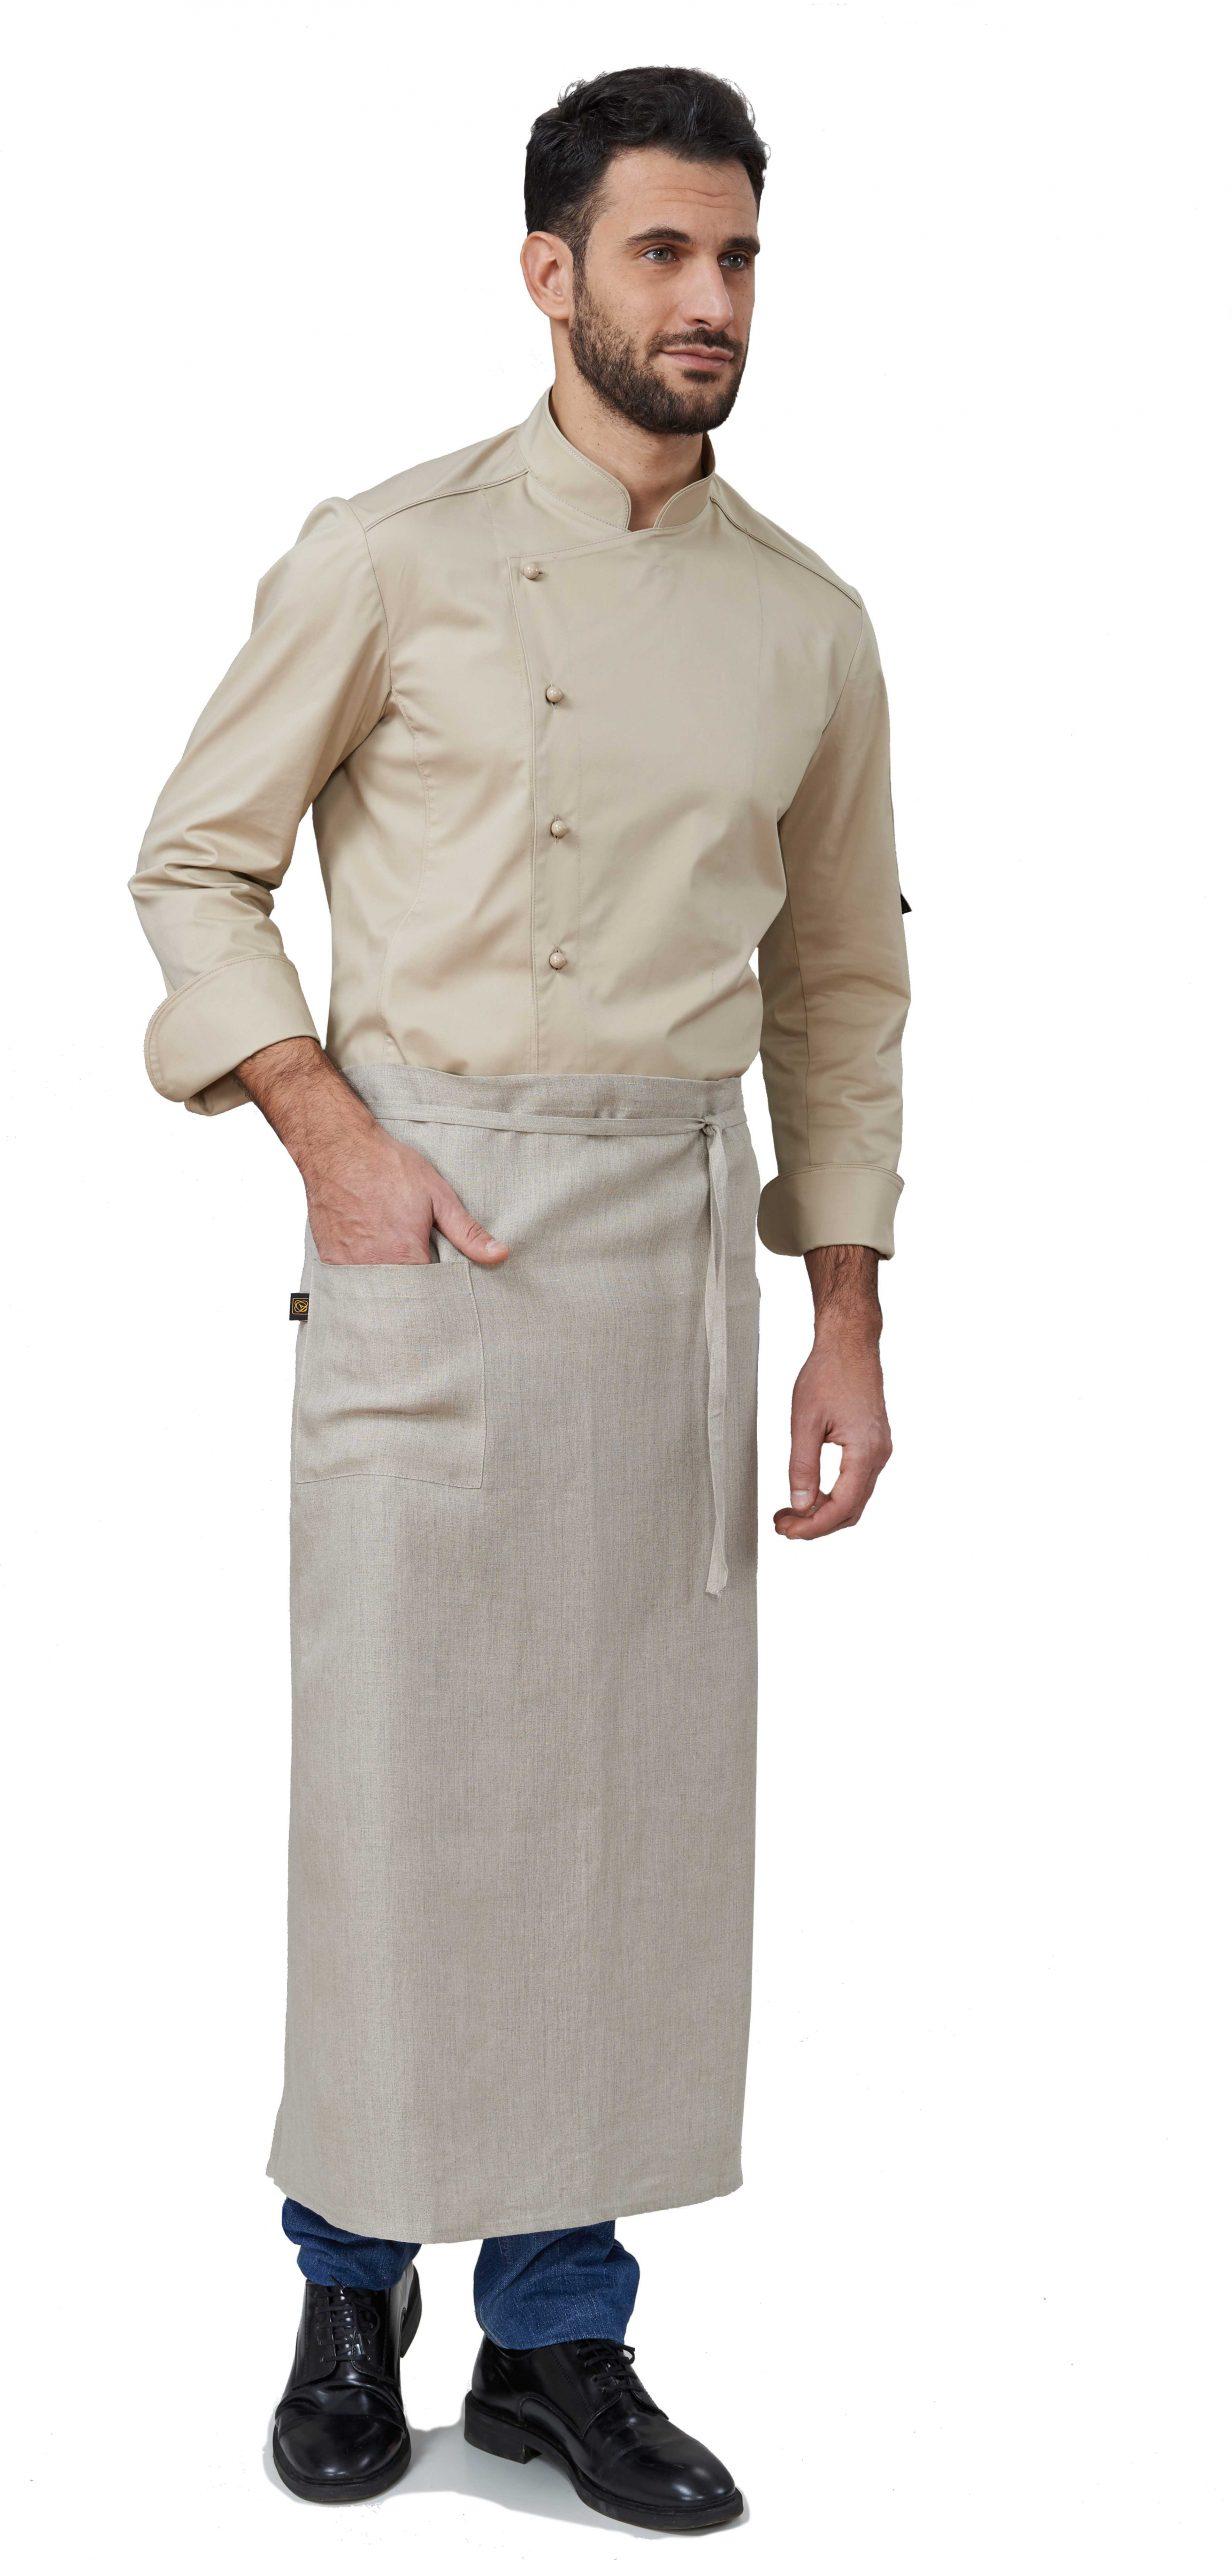 Gabriel, Giacca chef